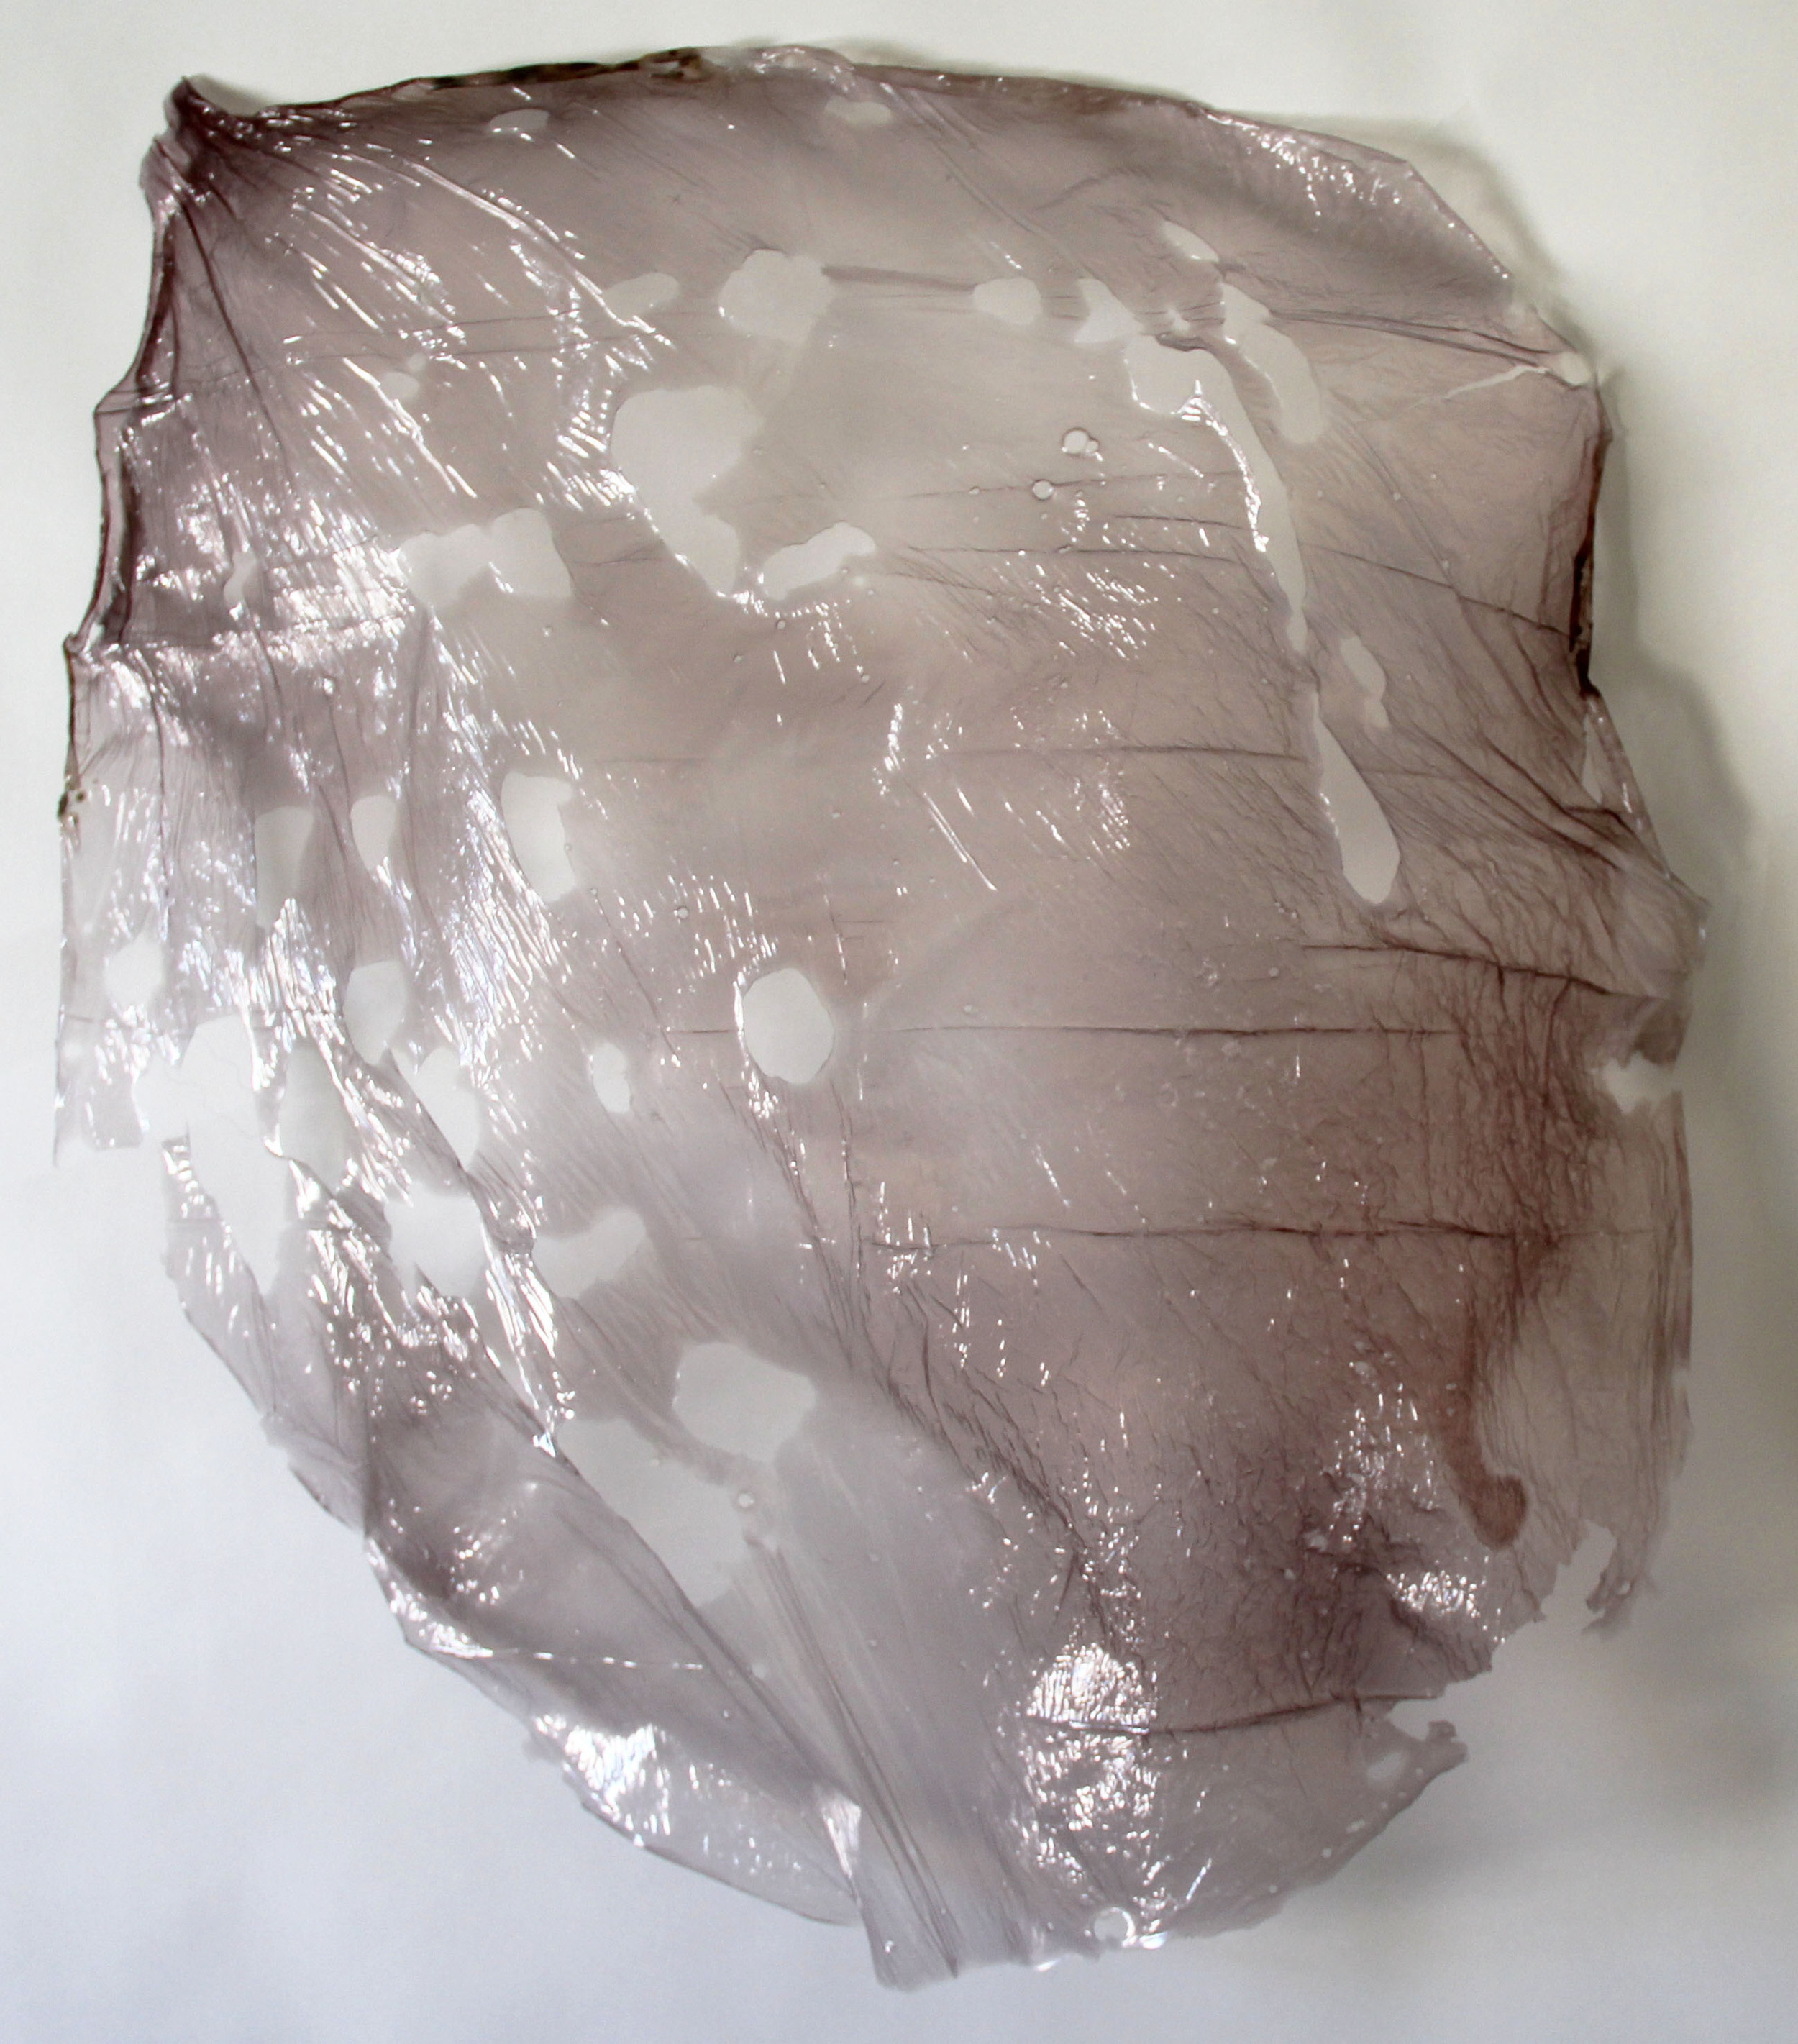 thin1 2014 gelatin, hibiscus 24 x 22 inches